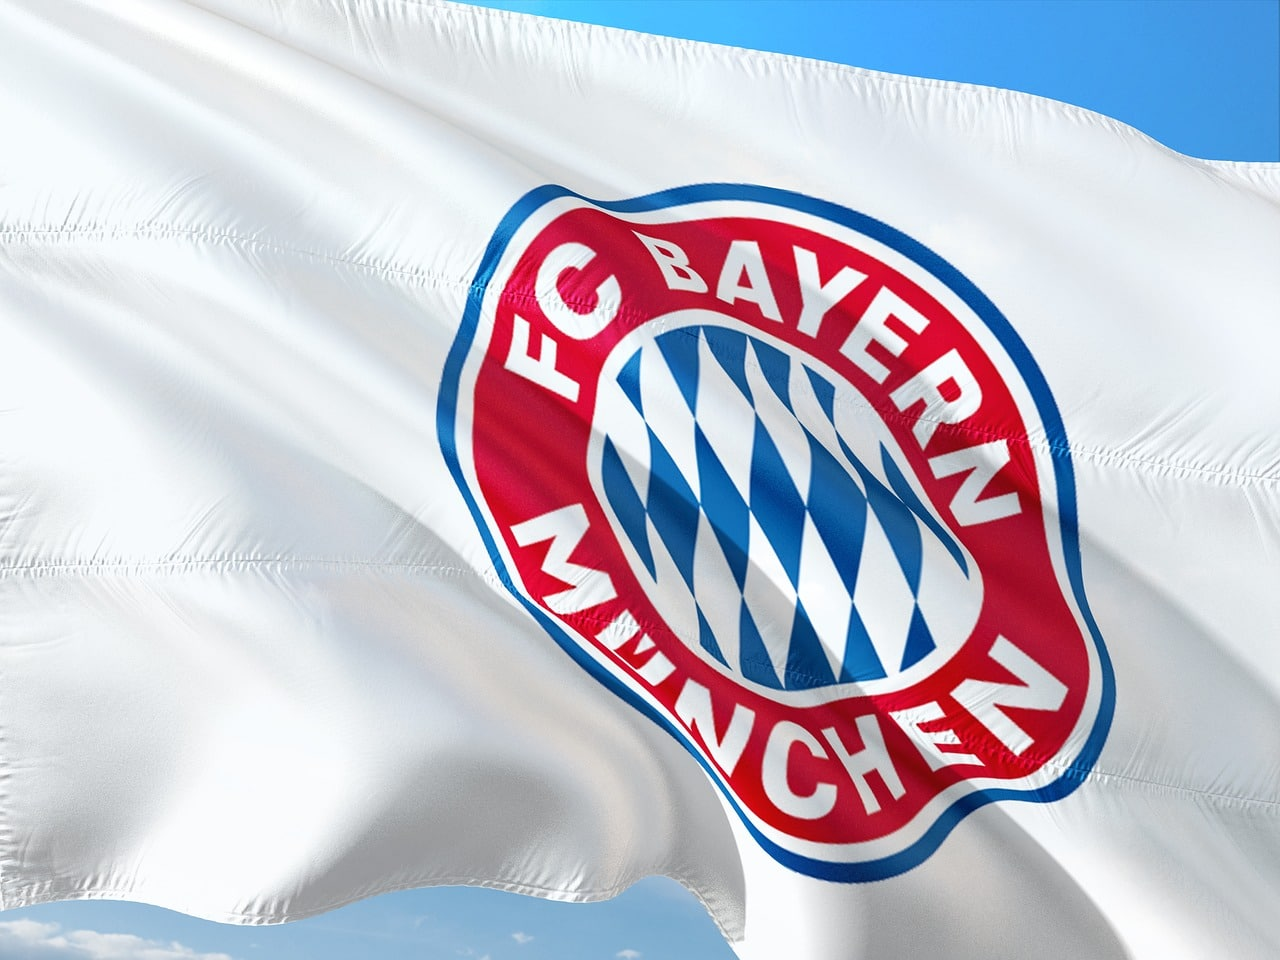 fcbayern-championsleague